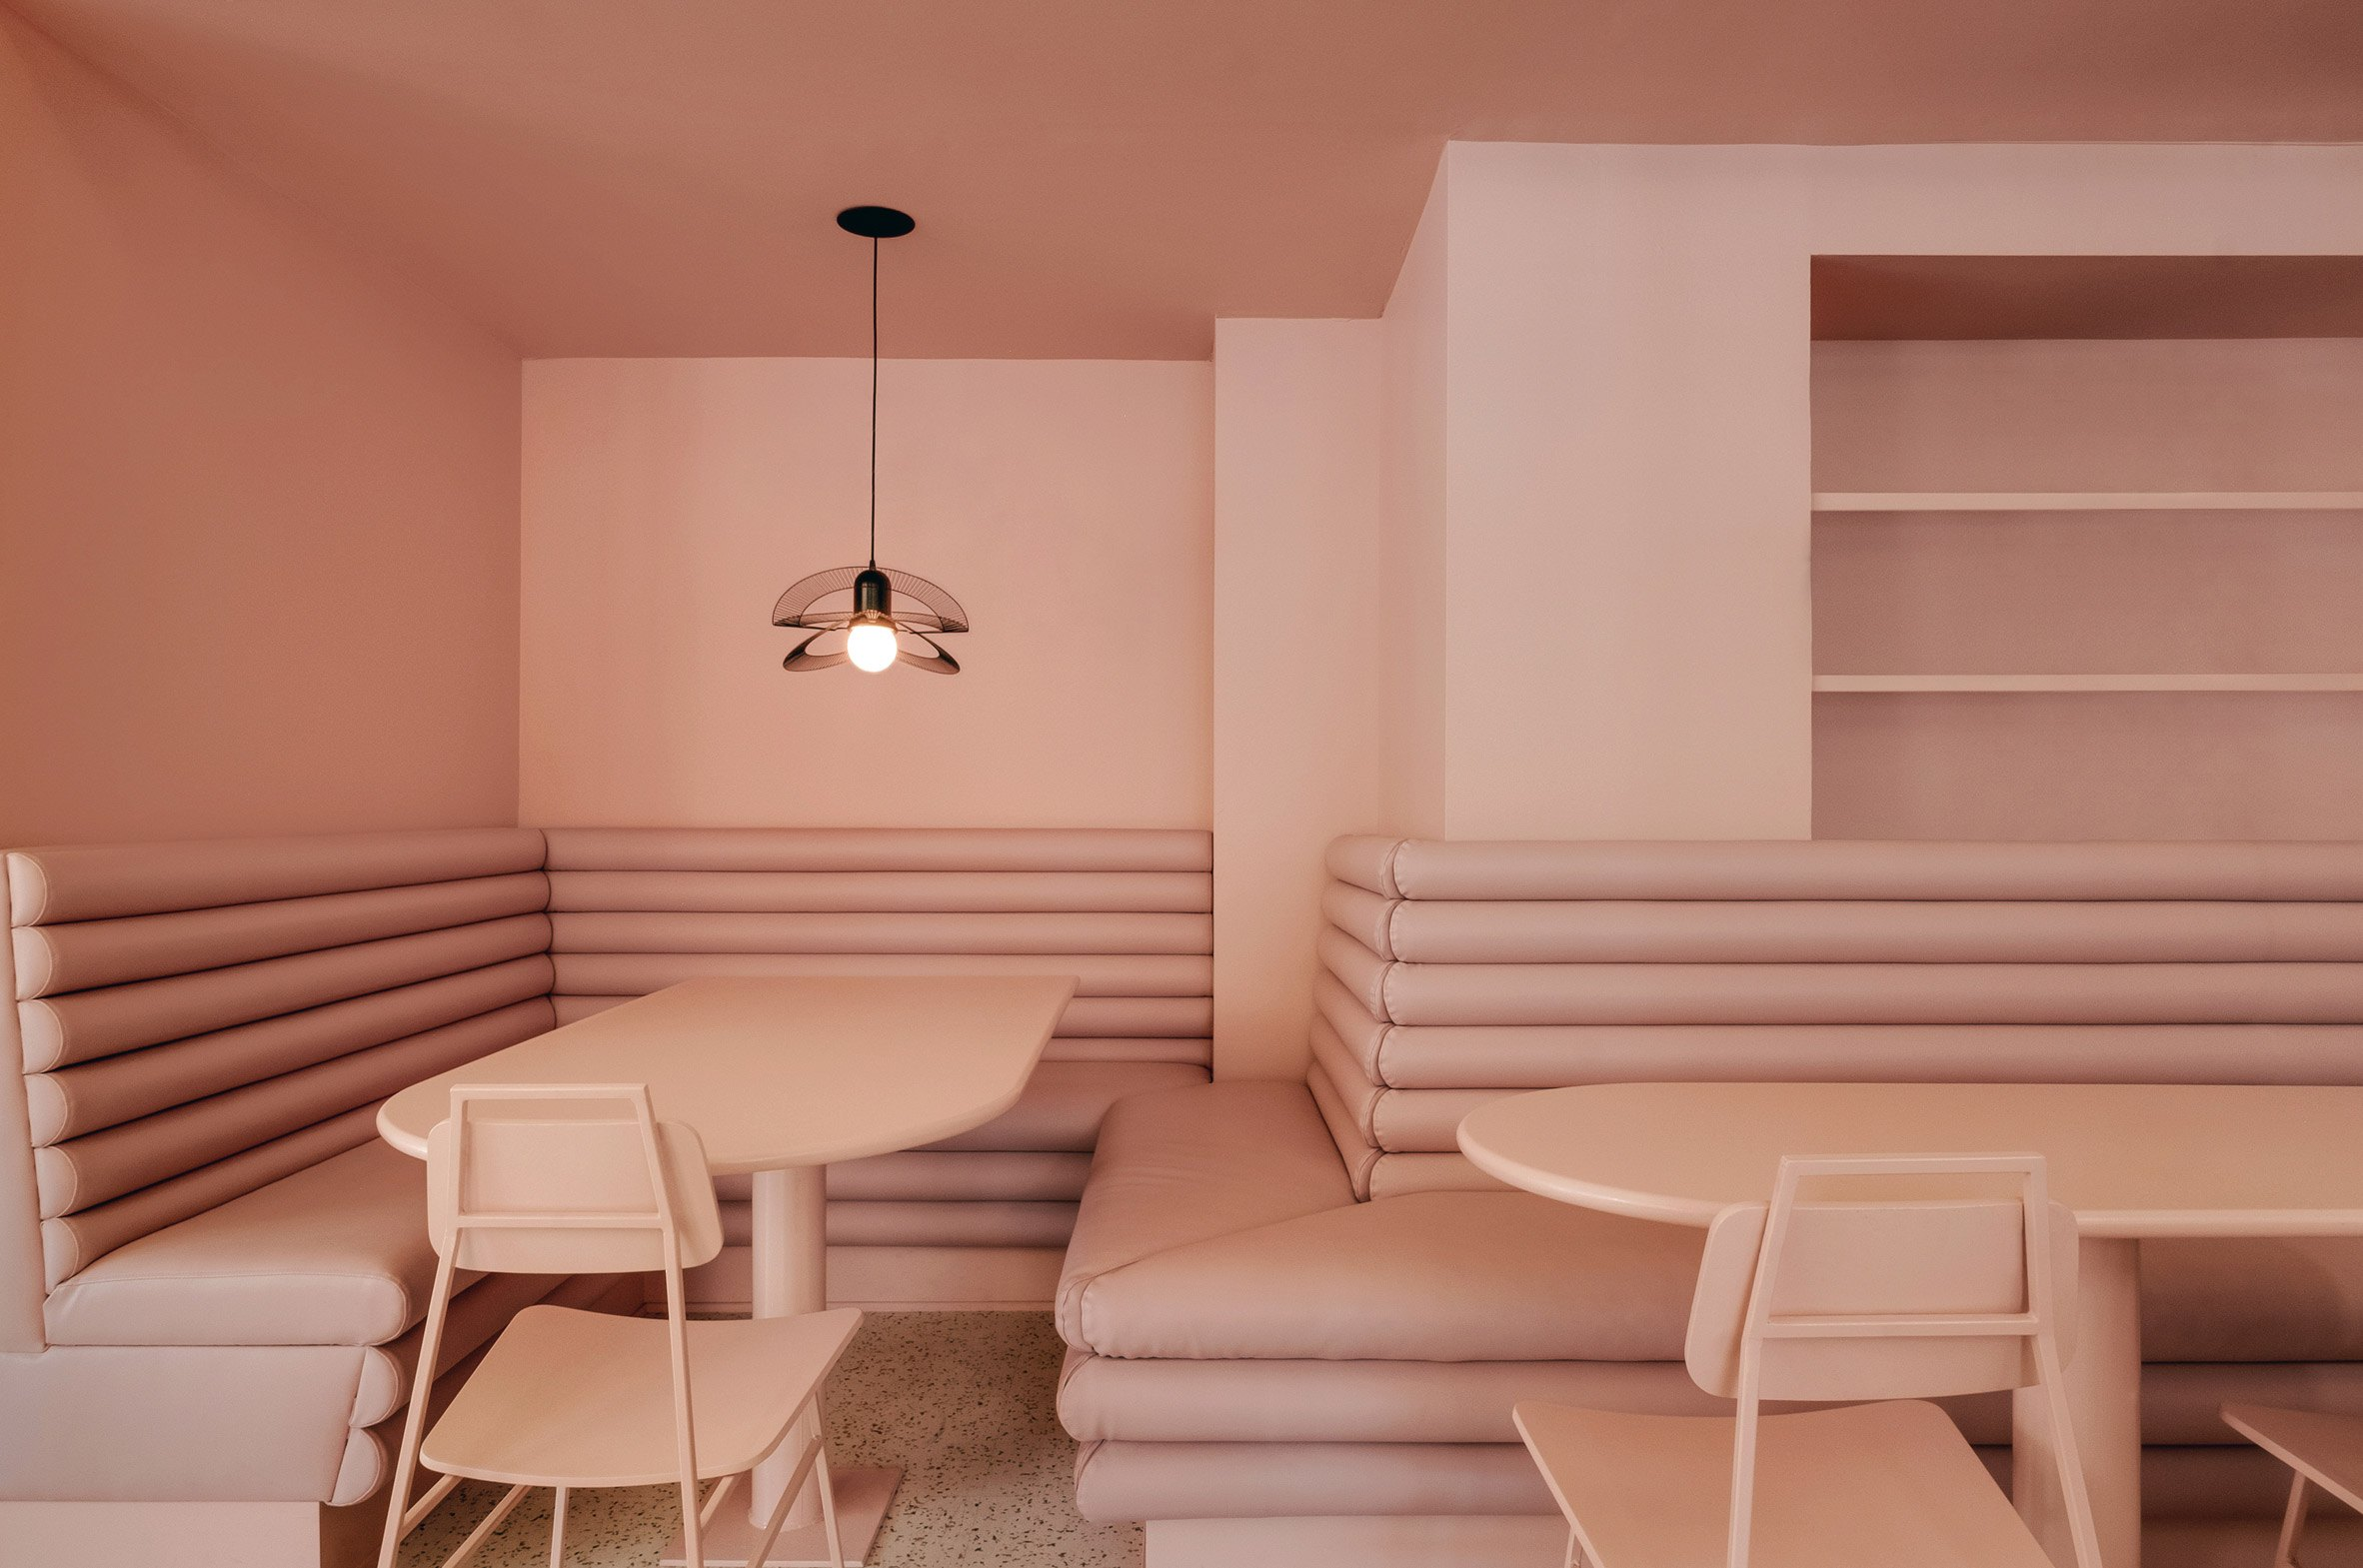 IGNANT-Architecture-Appareil-Architects-Pastel-Rita-Cafe-004